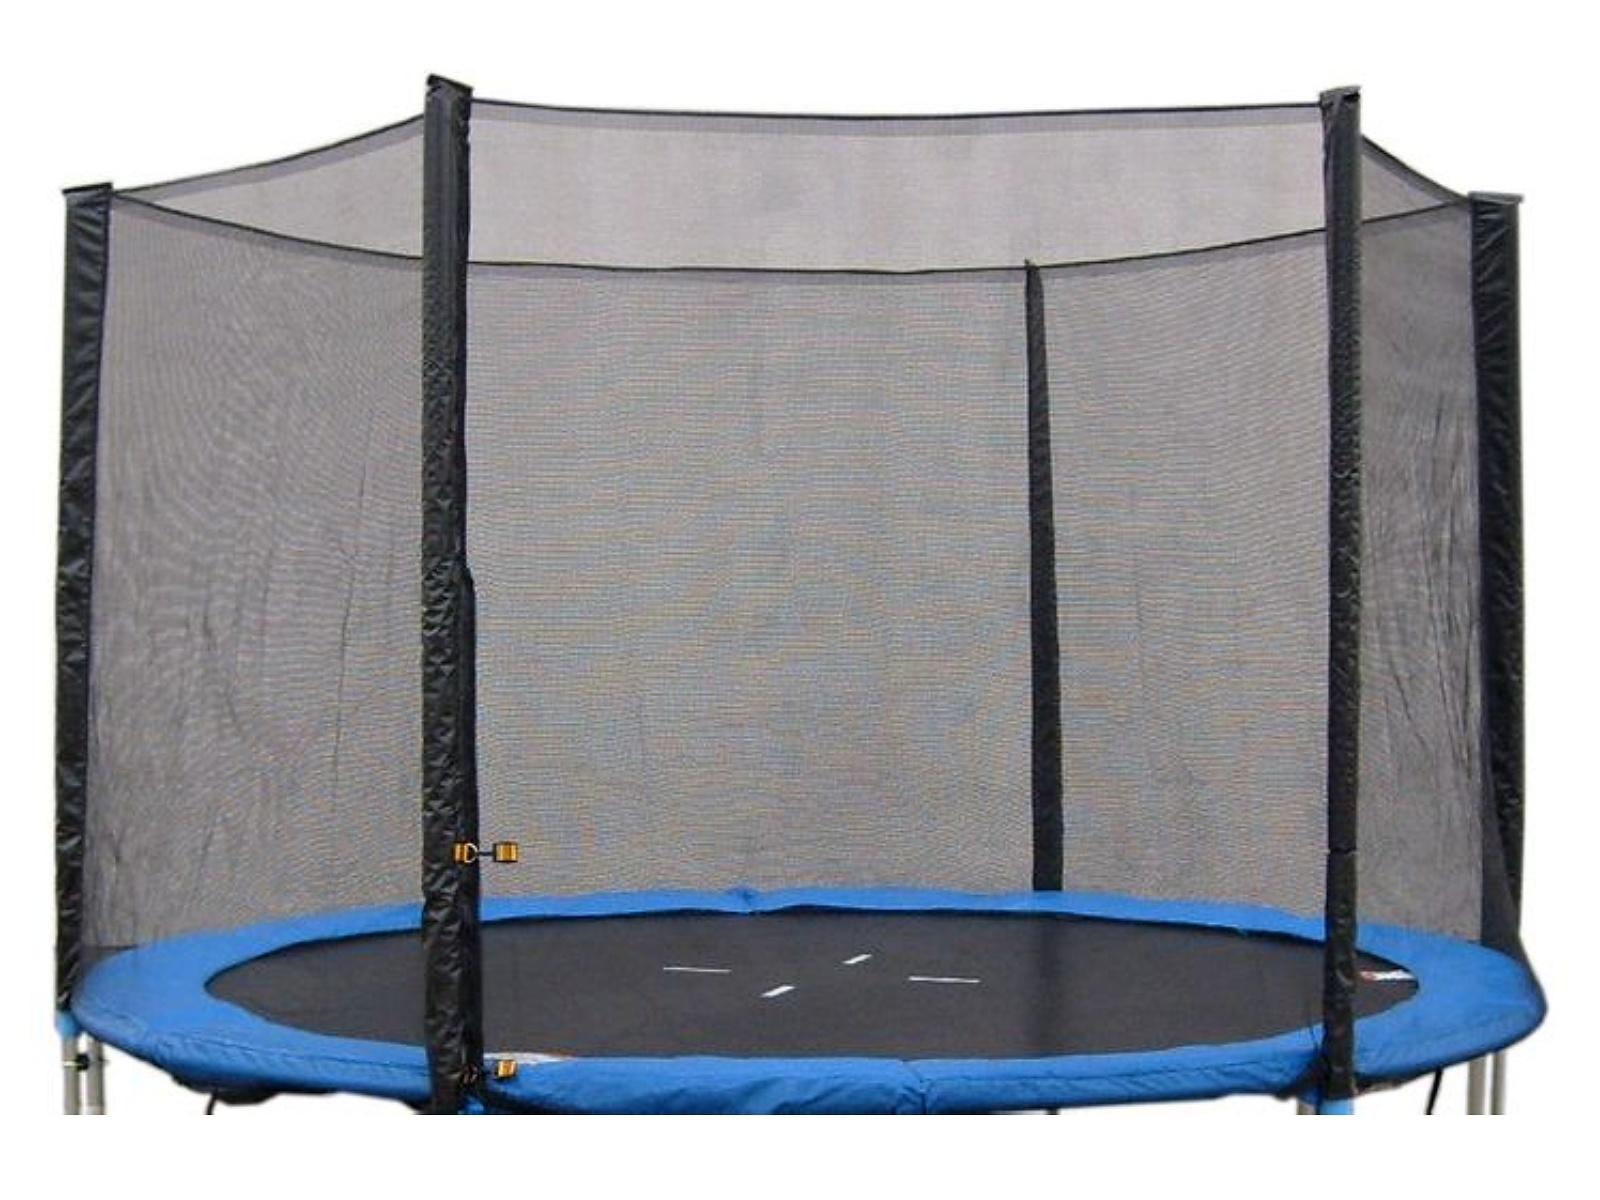 Mreža za trampolin, 396 cm